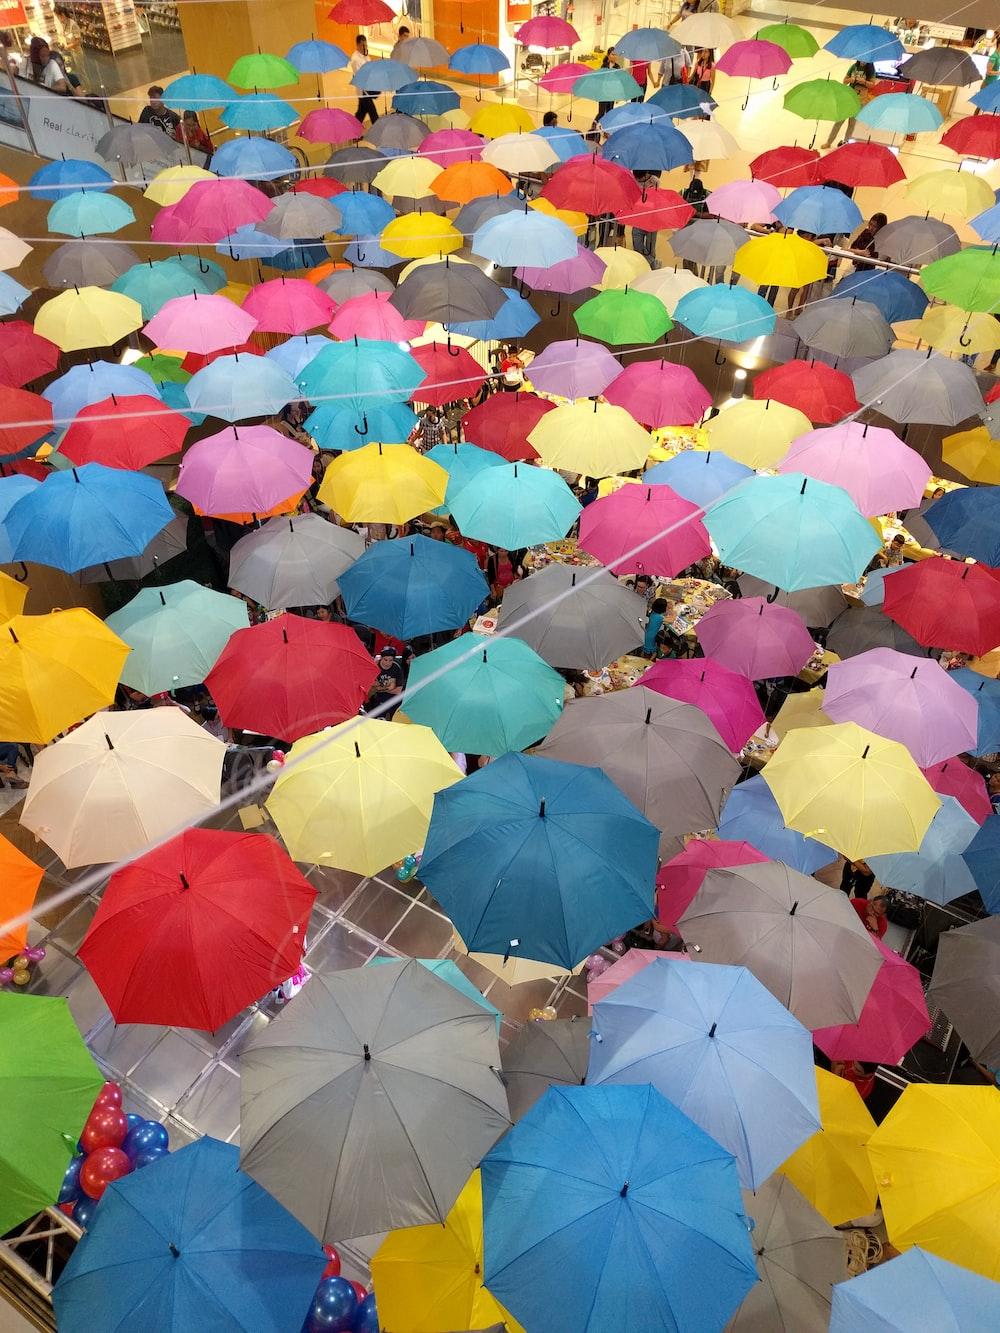 hanged umbrellas